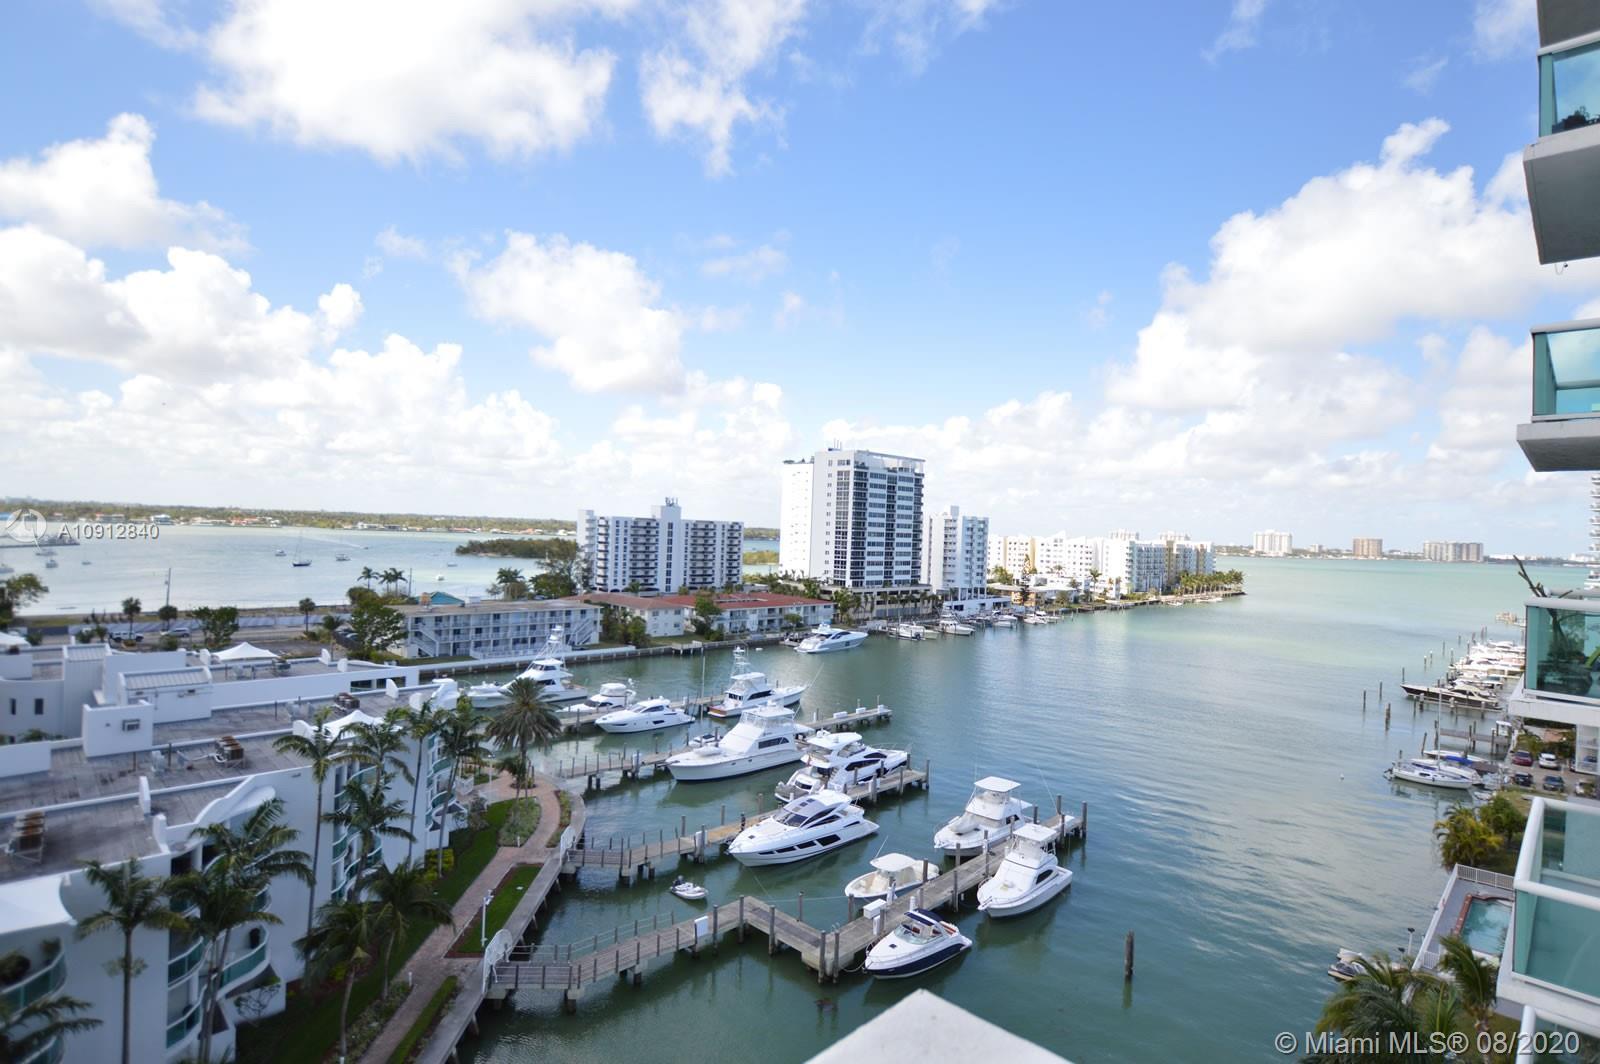 7910 Harbor Island Dr #903, North Bay Village FL 33141